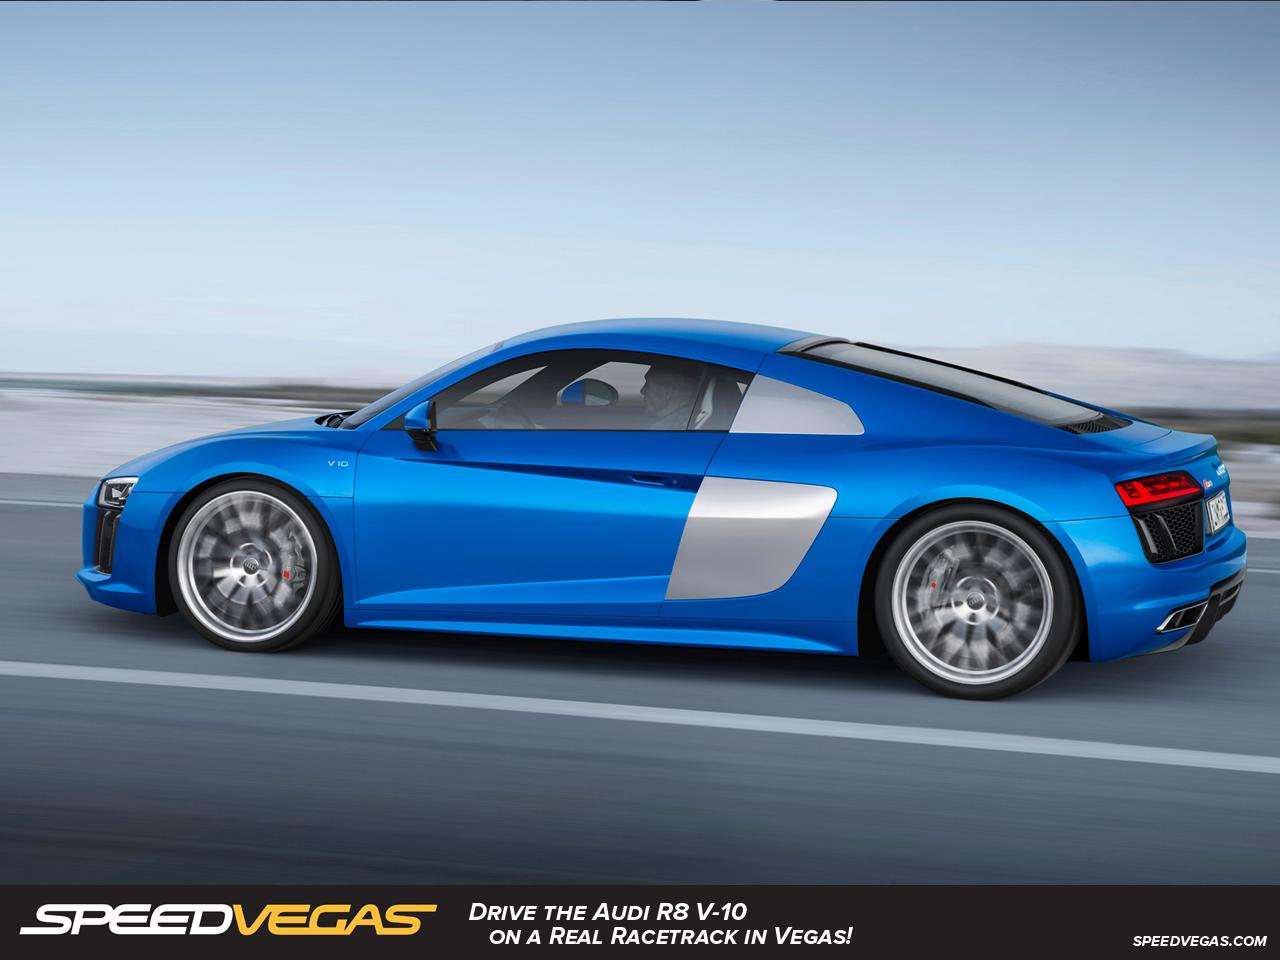 Drive A Audi R In Las Vegas Audi Driving Experience SPEEDVEGAS - Audi las vegas